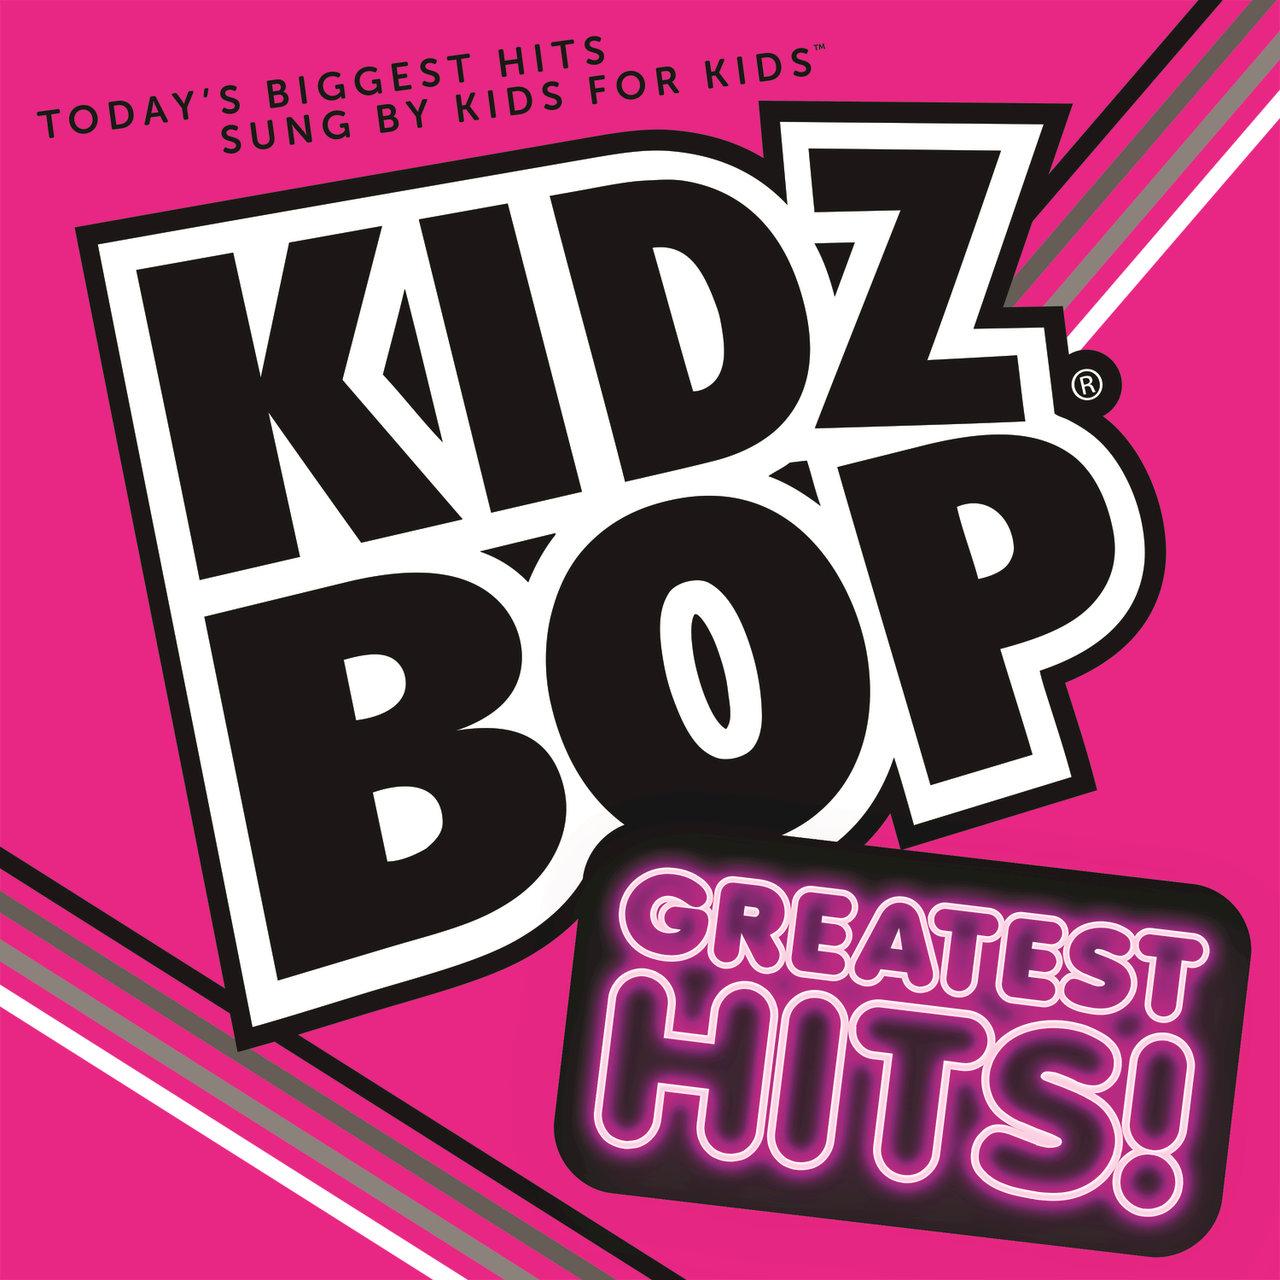 kidz bop | kidz bop greatest hits | kidz bop